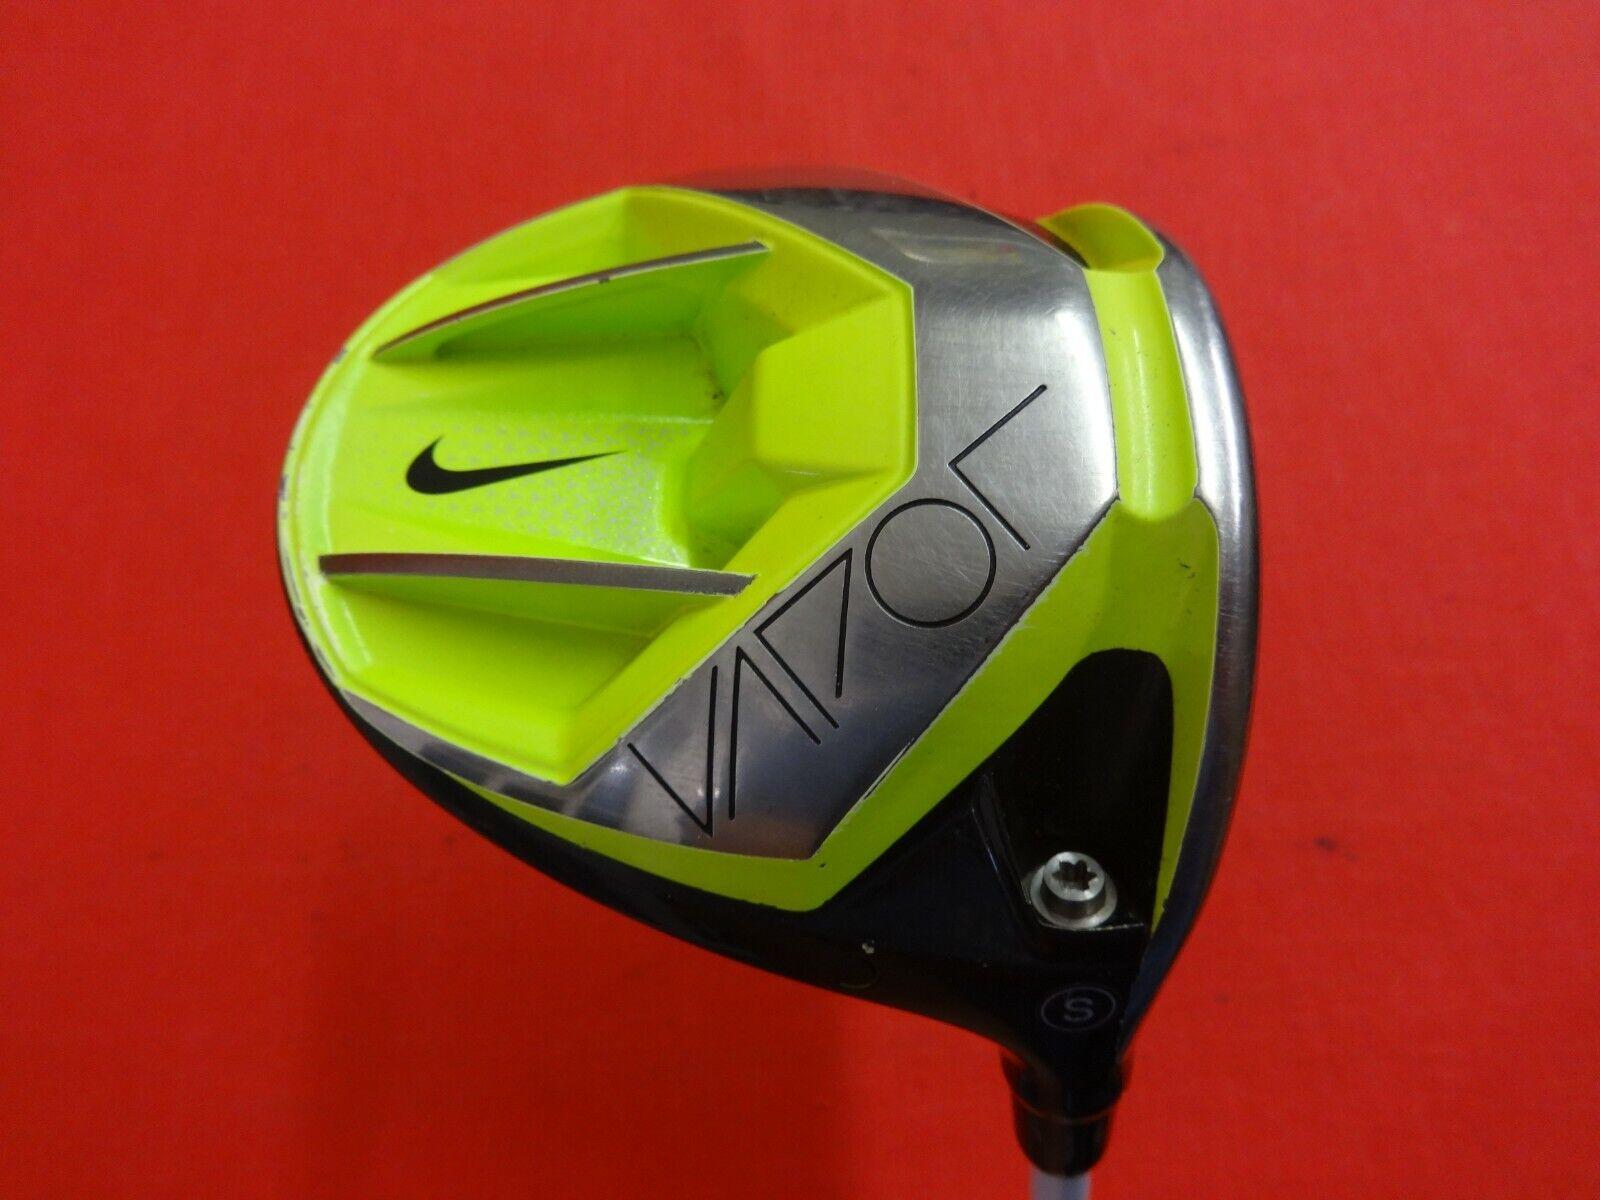 empujar preposición Realista  Nike Vapor Speed Driver Fubuki Z50 X-stiff Flex Shaft for sale online   eBay